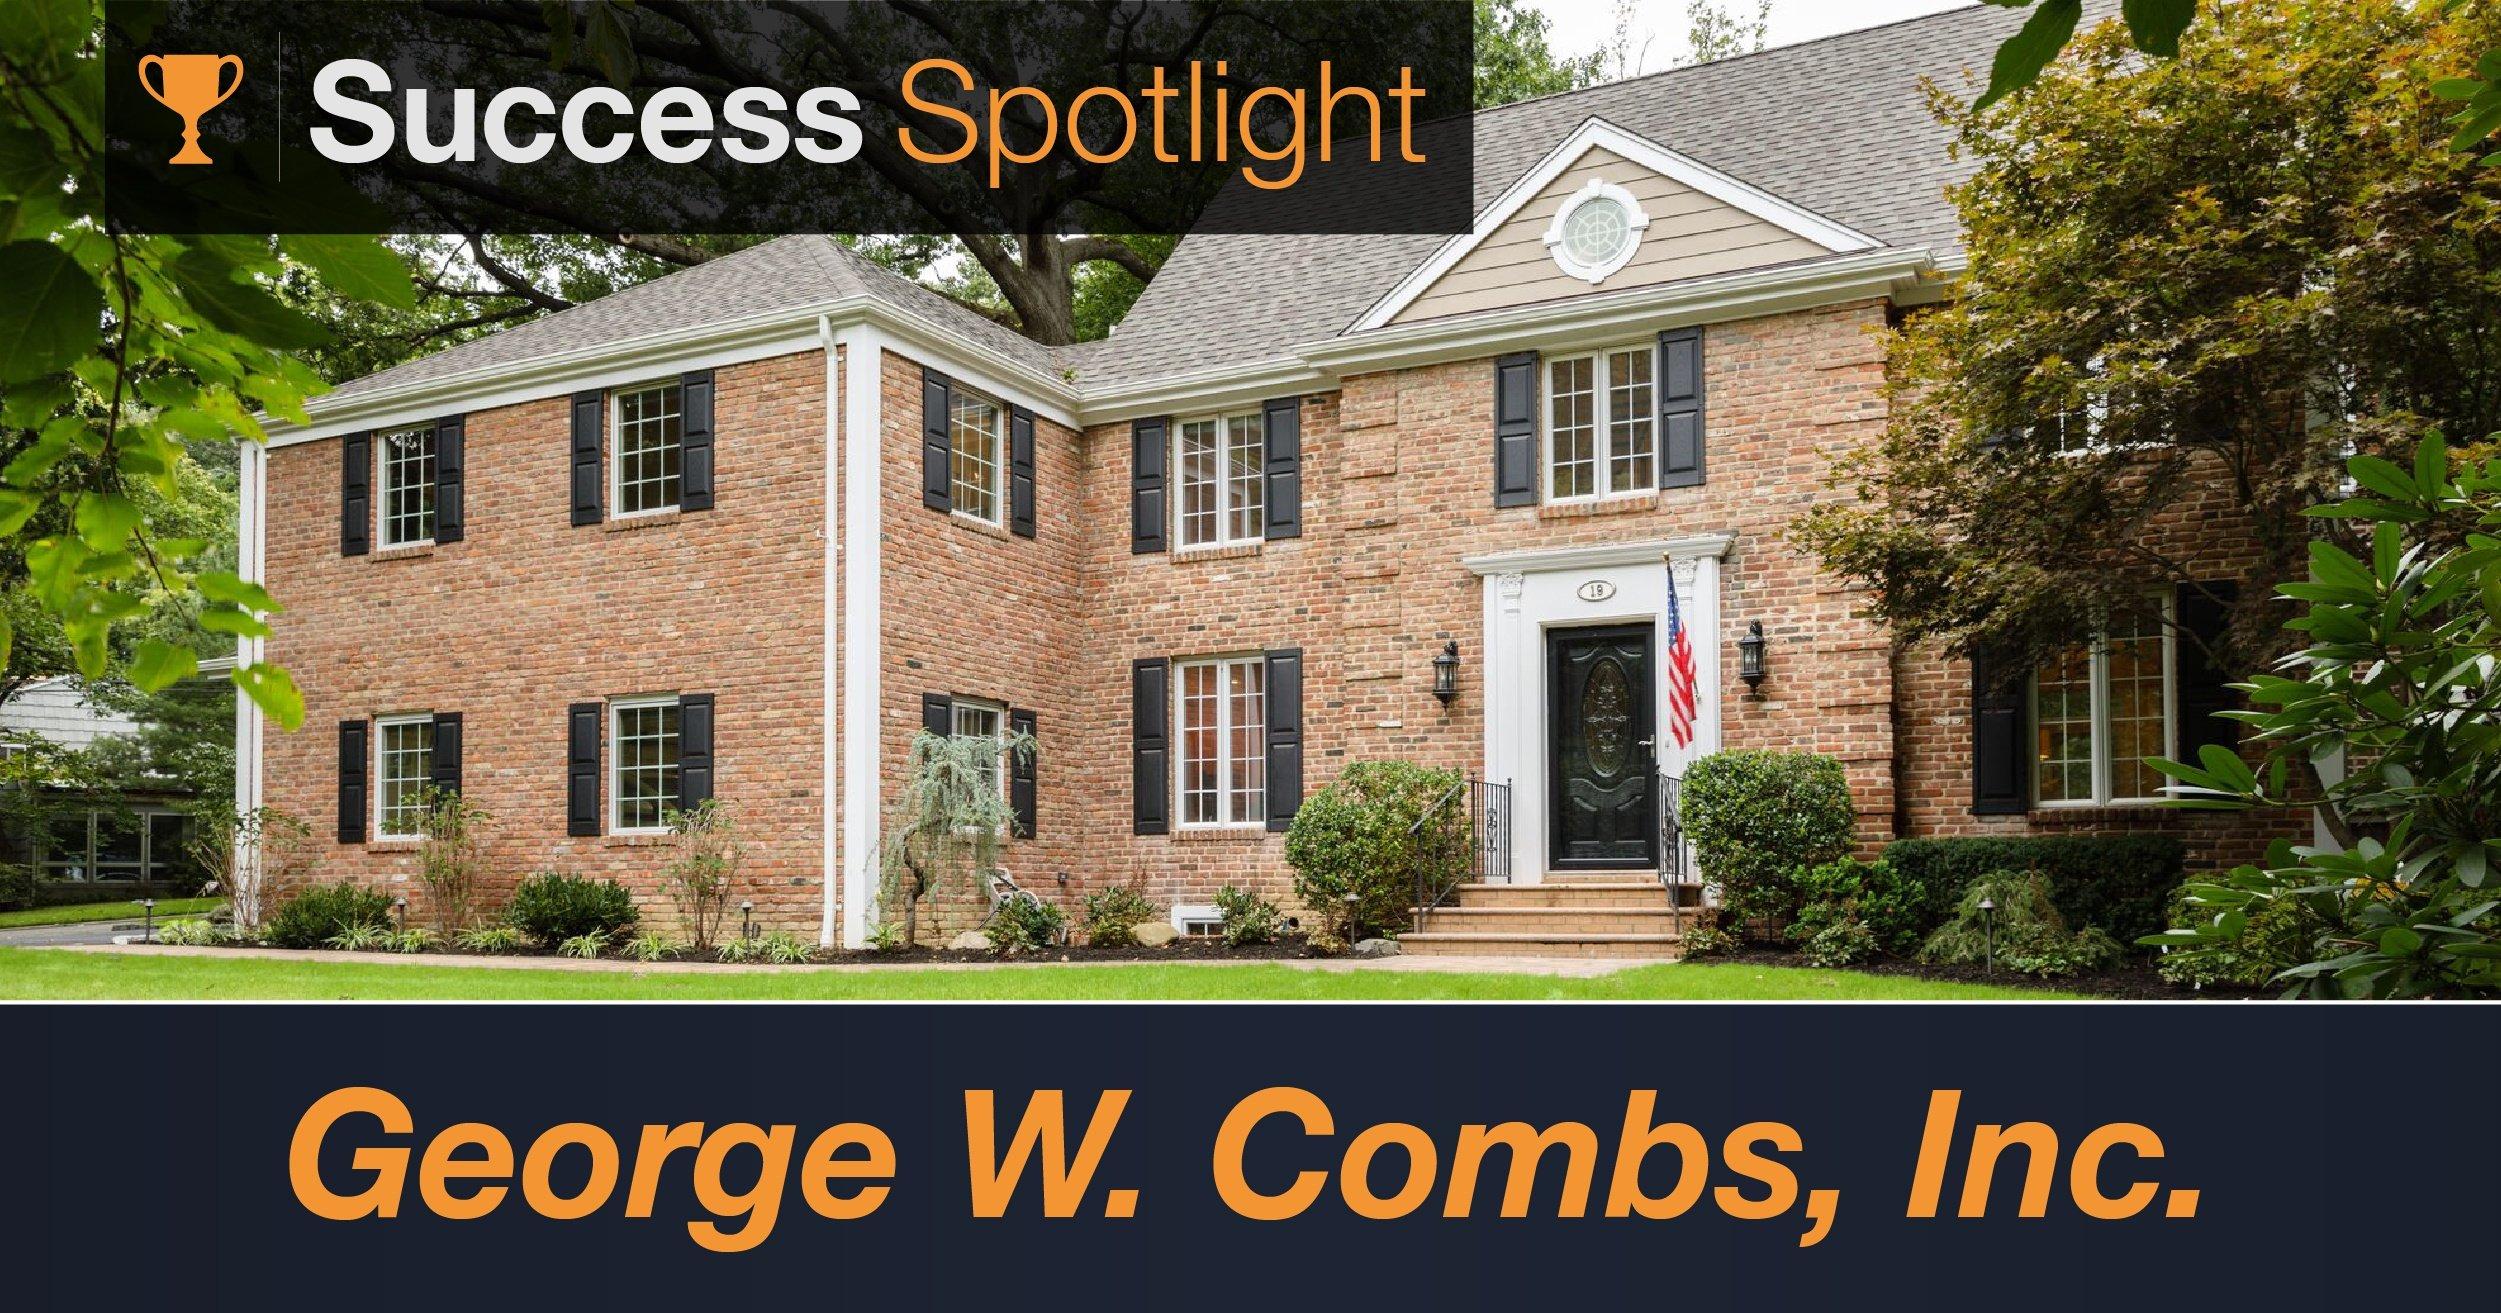 Success Spotlight: George W. Combs, Inc.